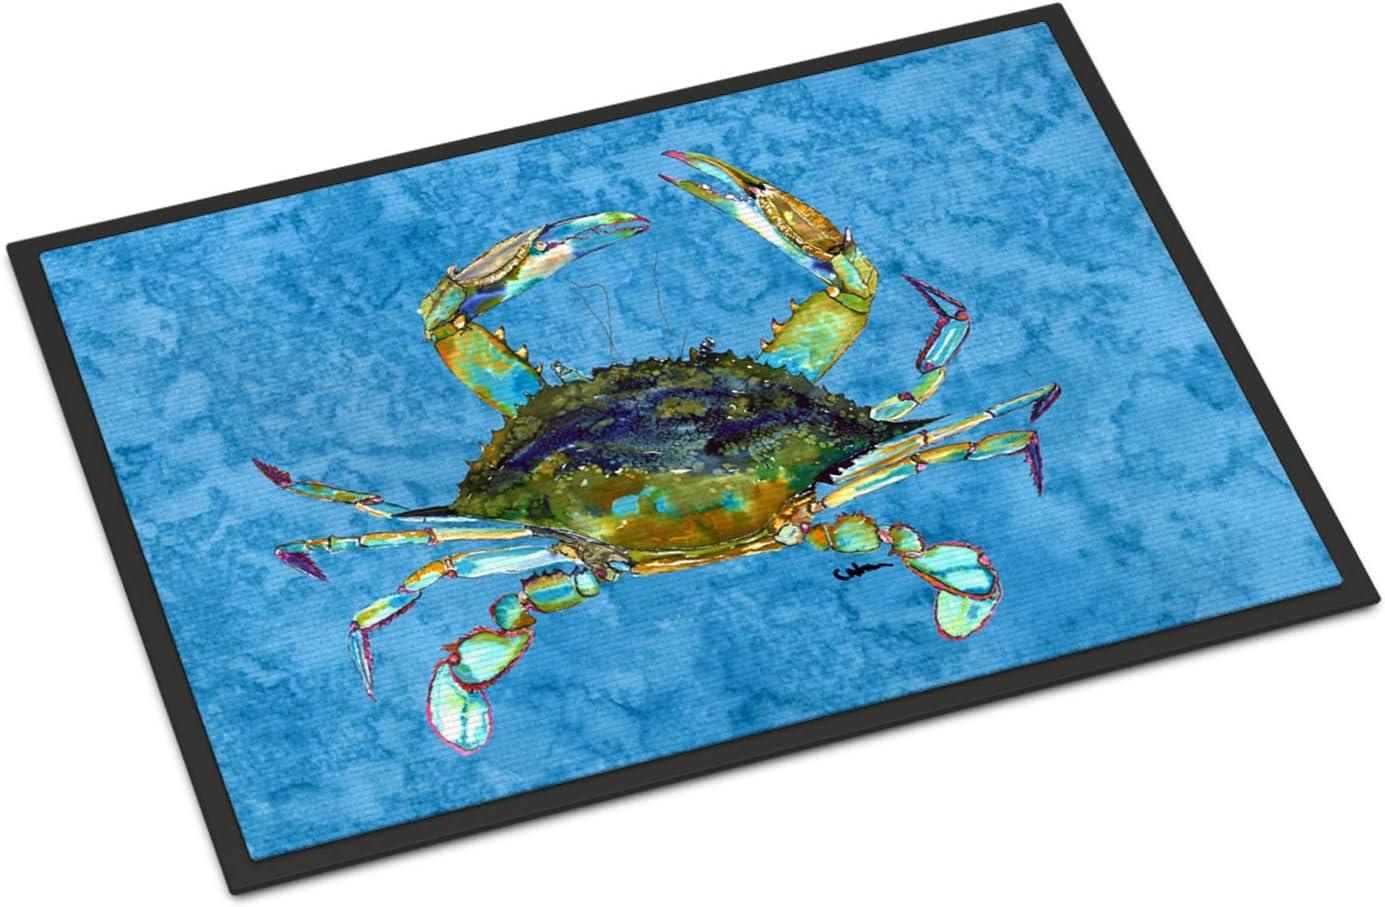 Carolines Treasures 8656-JMAT Crab Indoor or Outdoor Doormat Multicolor 24 x 36